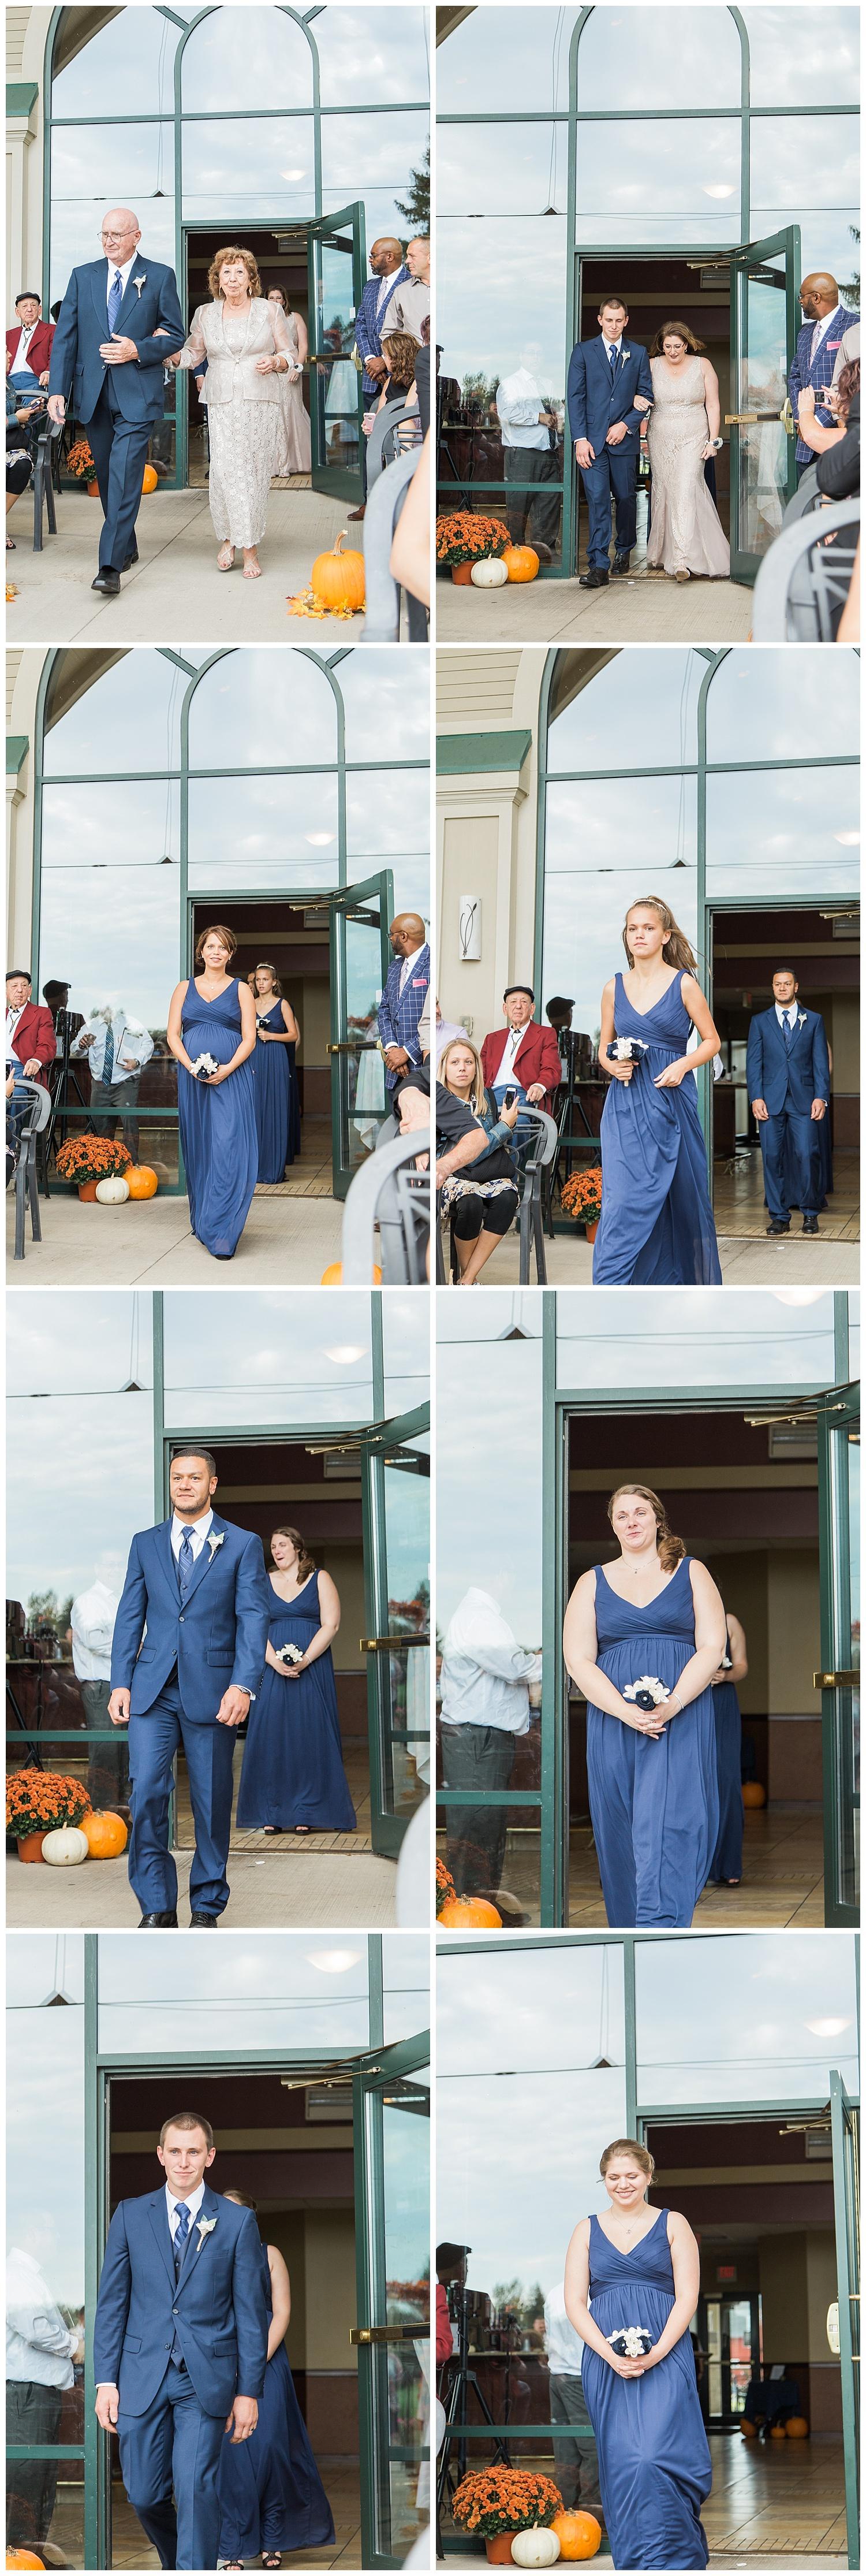 Jessica and Scott McKay - Terry Hills Golf Course - Batavia NY - Lass and Beau-556_Buffalo wedding photography.jpg